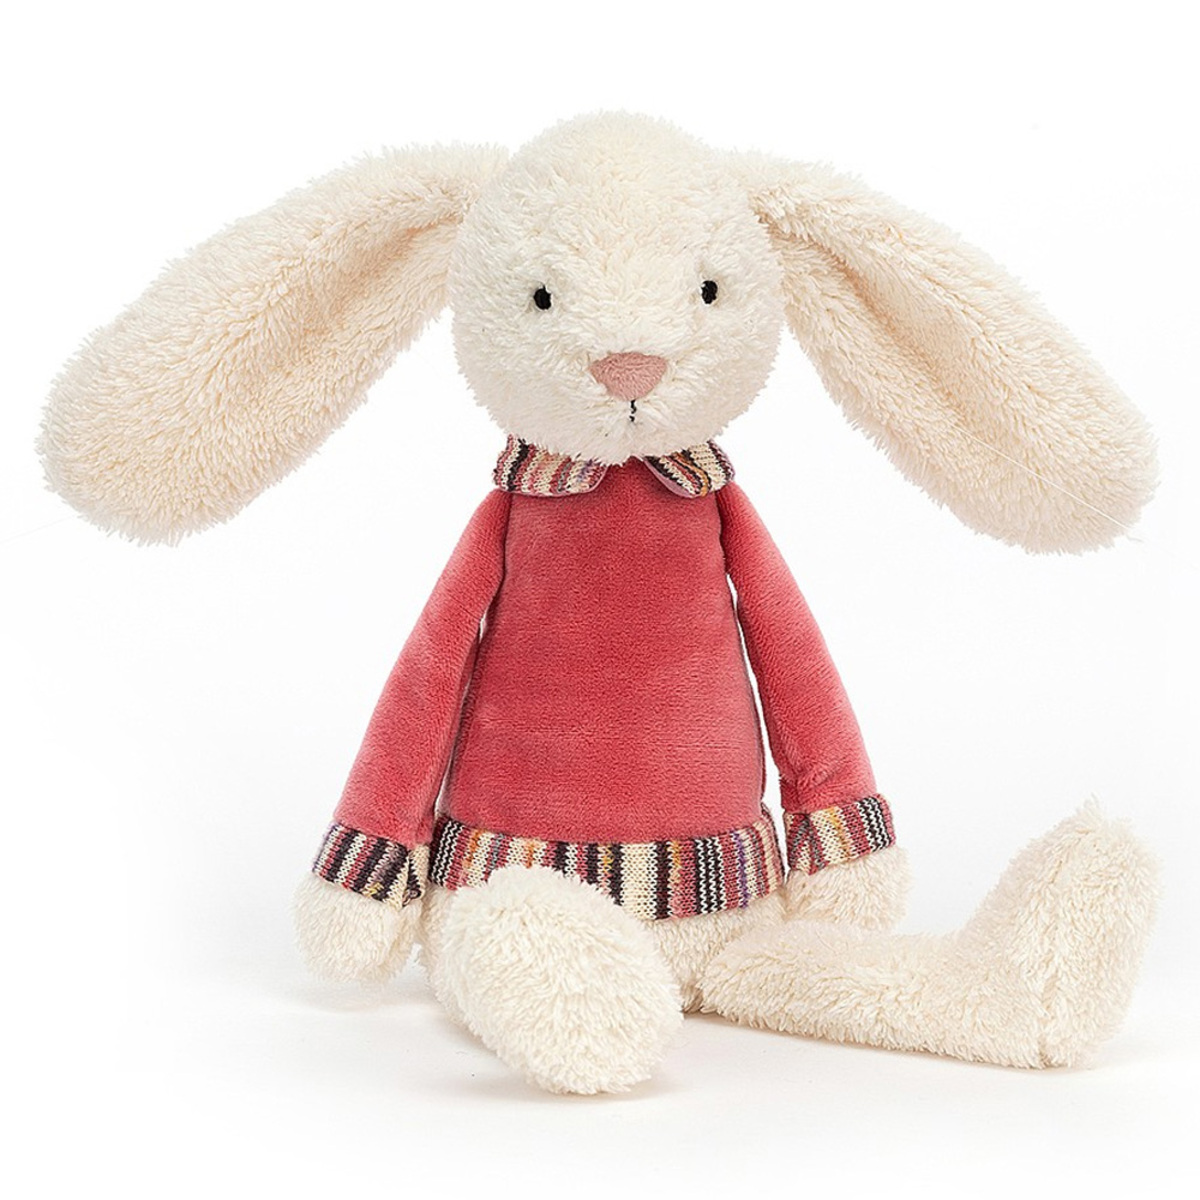 Peluche Lingley Bunny Peluche Lapin 29 cm